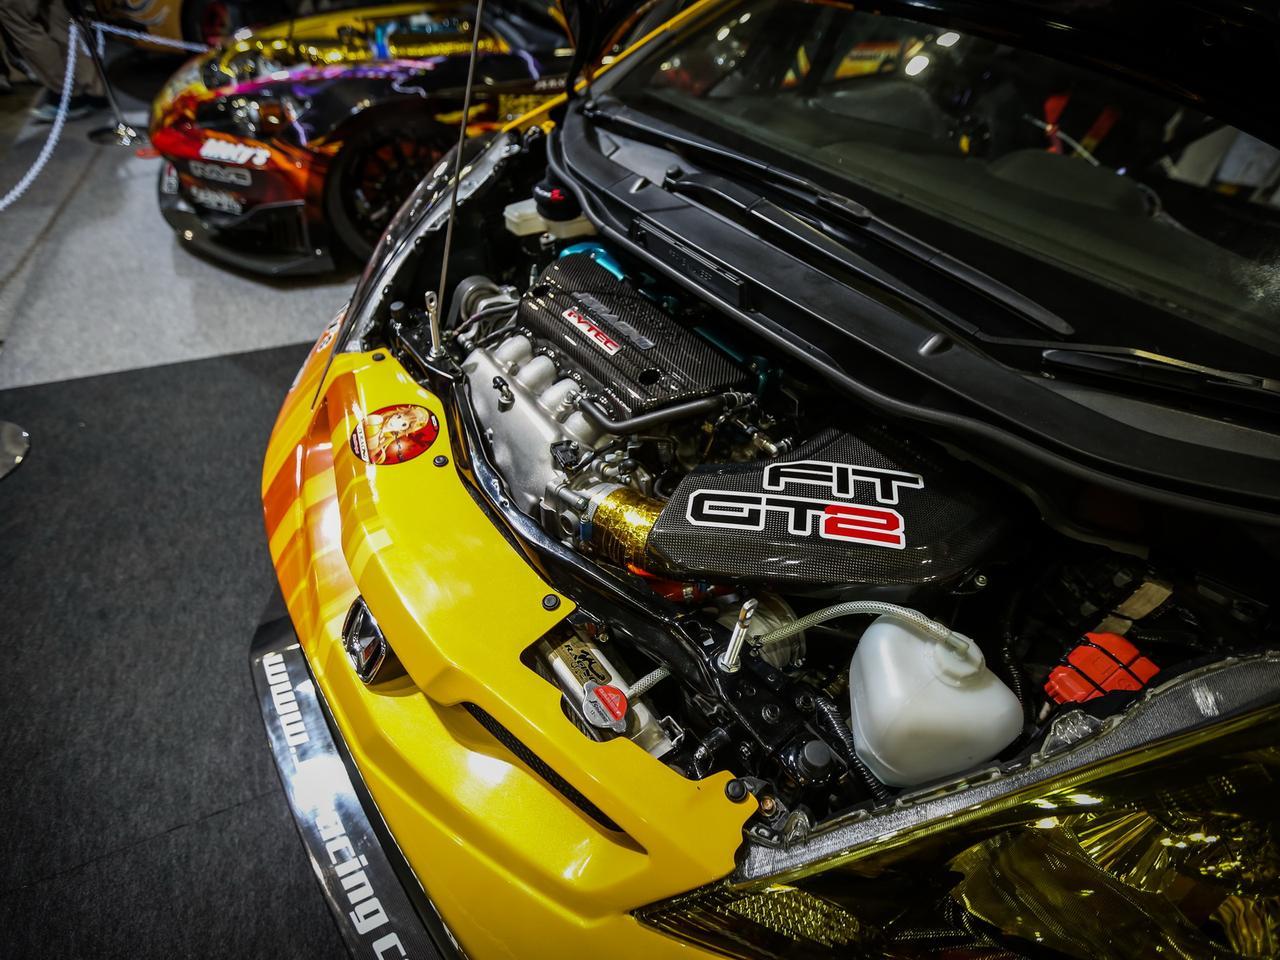 J's Racing 东京改装展 本田改装 K20A 飞度FitGT-2  S2000